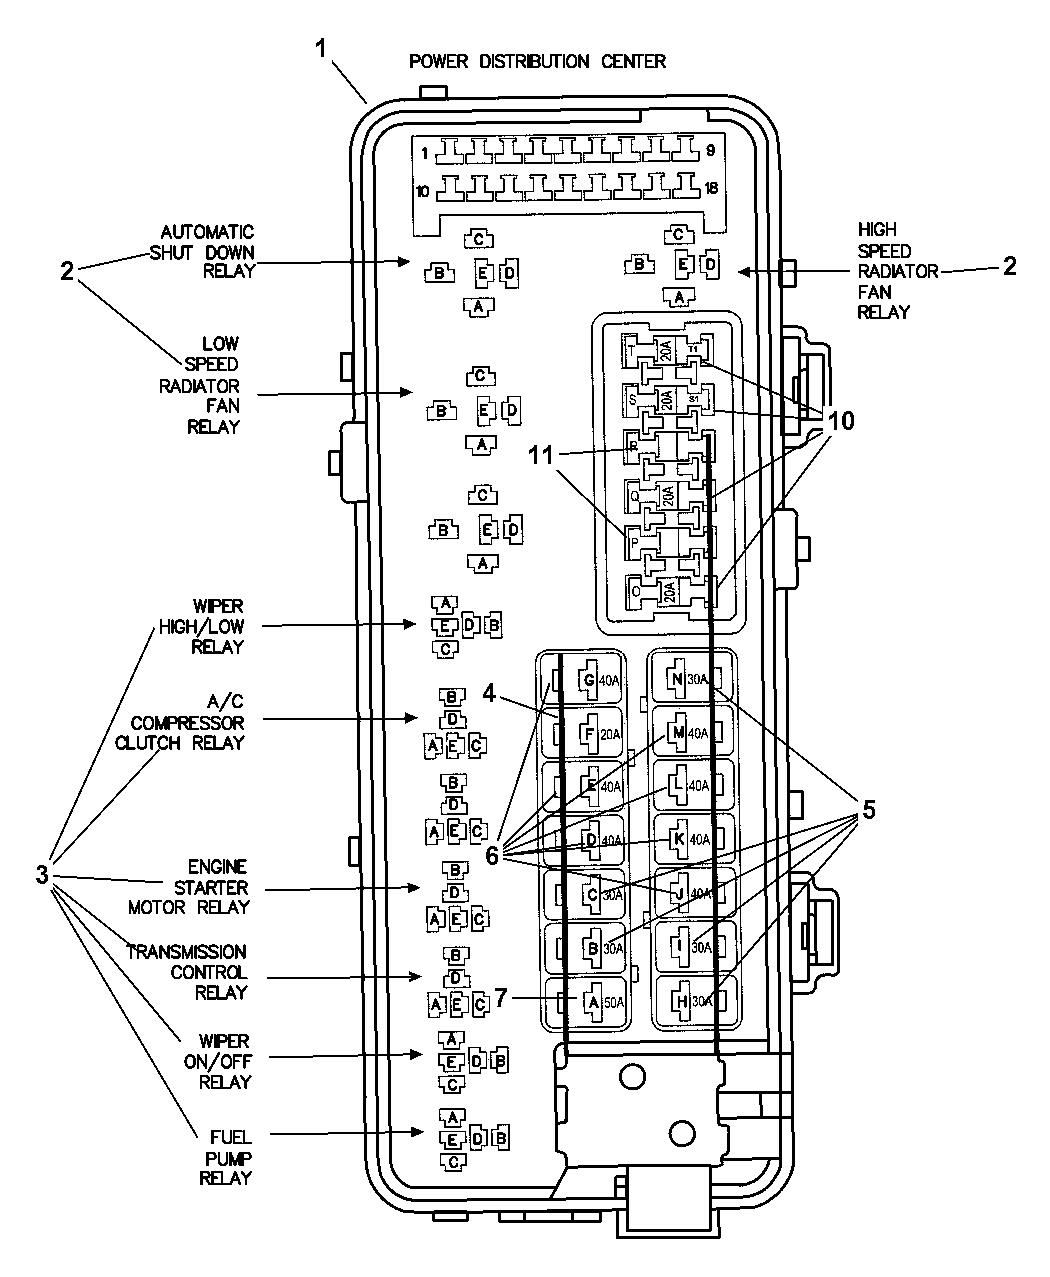 Dodge Ram 1500 Wiring Diagram Further 2000 Dodge Intrepid Fuse Diagram